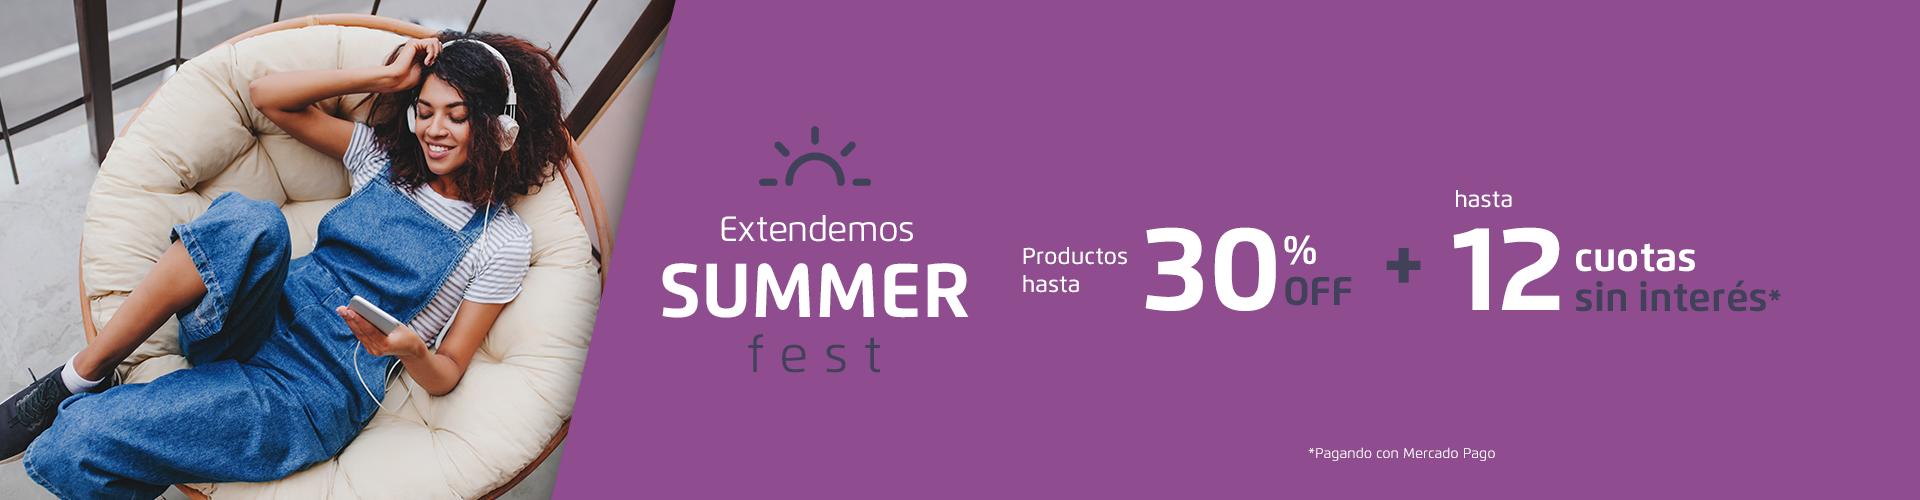 extendemos Summer fest